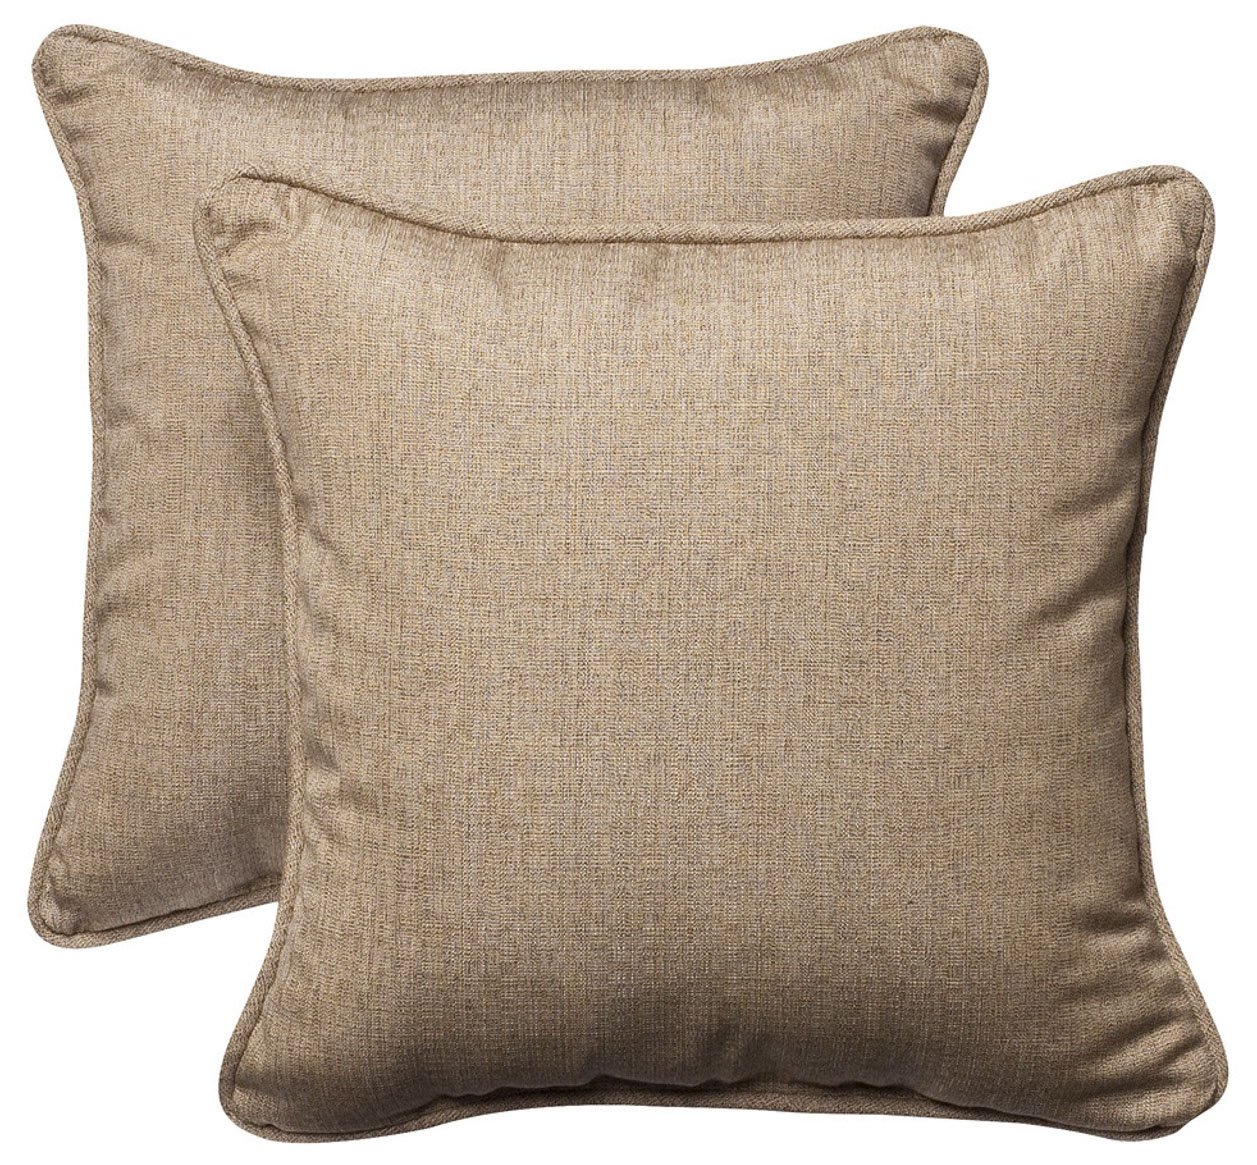 Hospitality Rattan 606-9203-OTP Large Outdoor Throw Pillows, Set of 2, 22'' x 22'', Sunbrella Canvas Spa